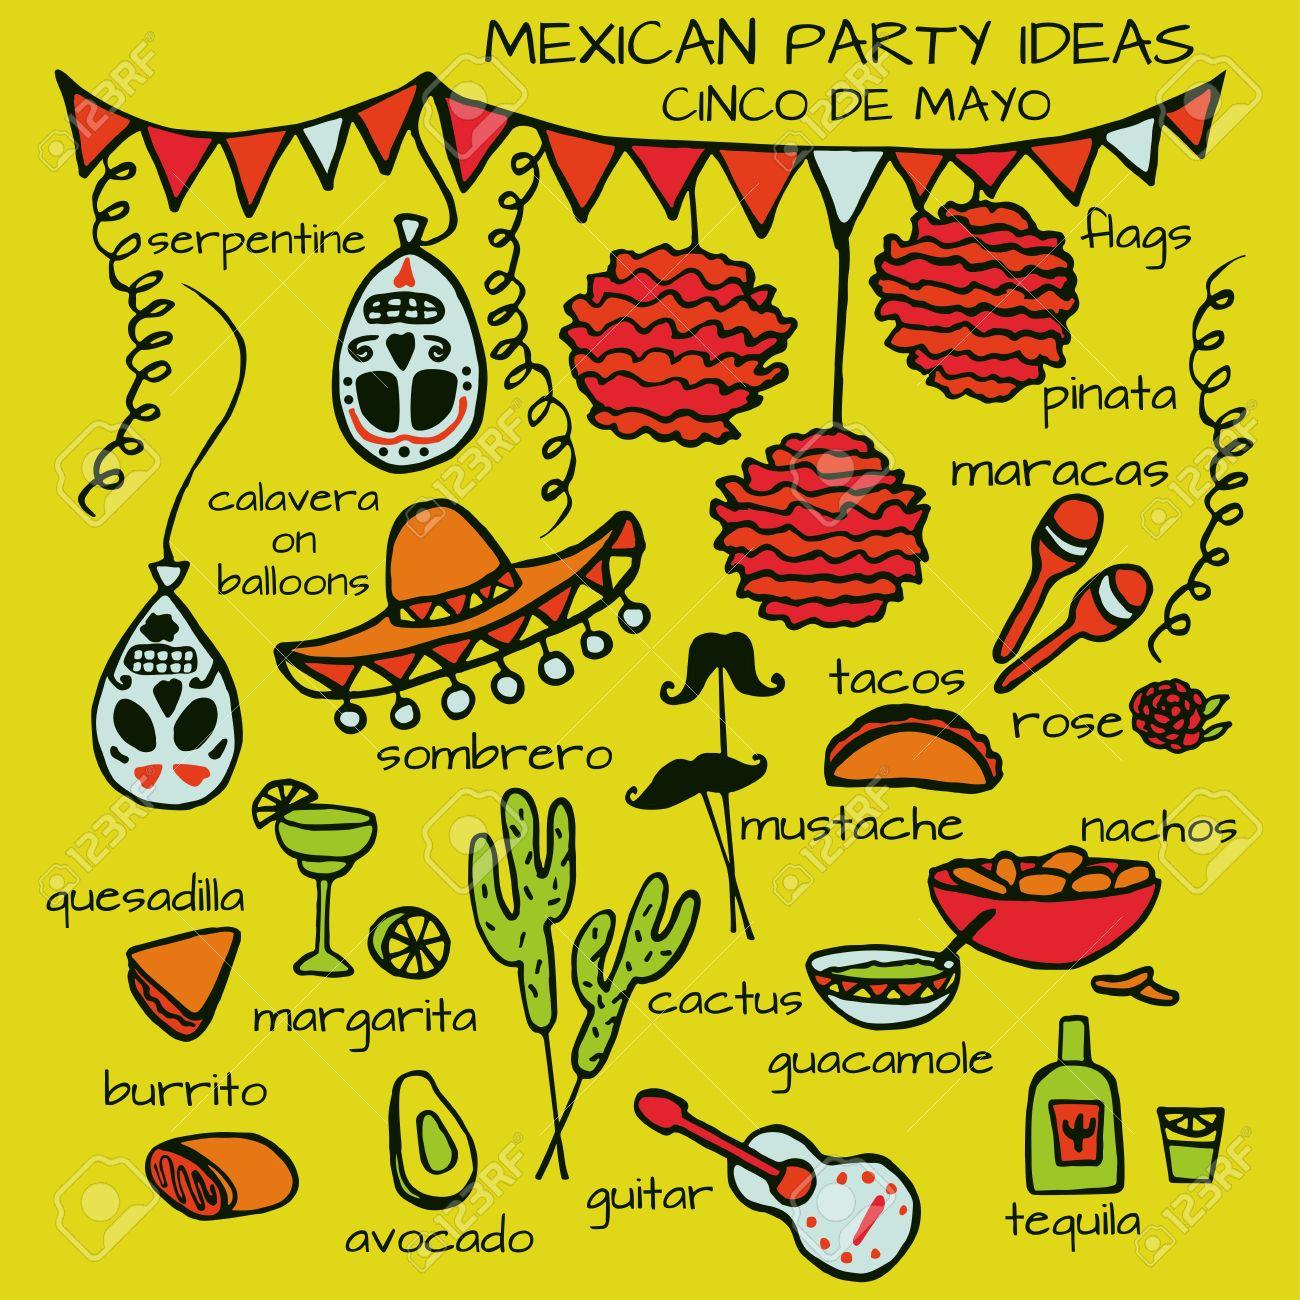 Doodle Set Of Mexican Party Ideas Cinco De Mayo Elements Mexico